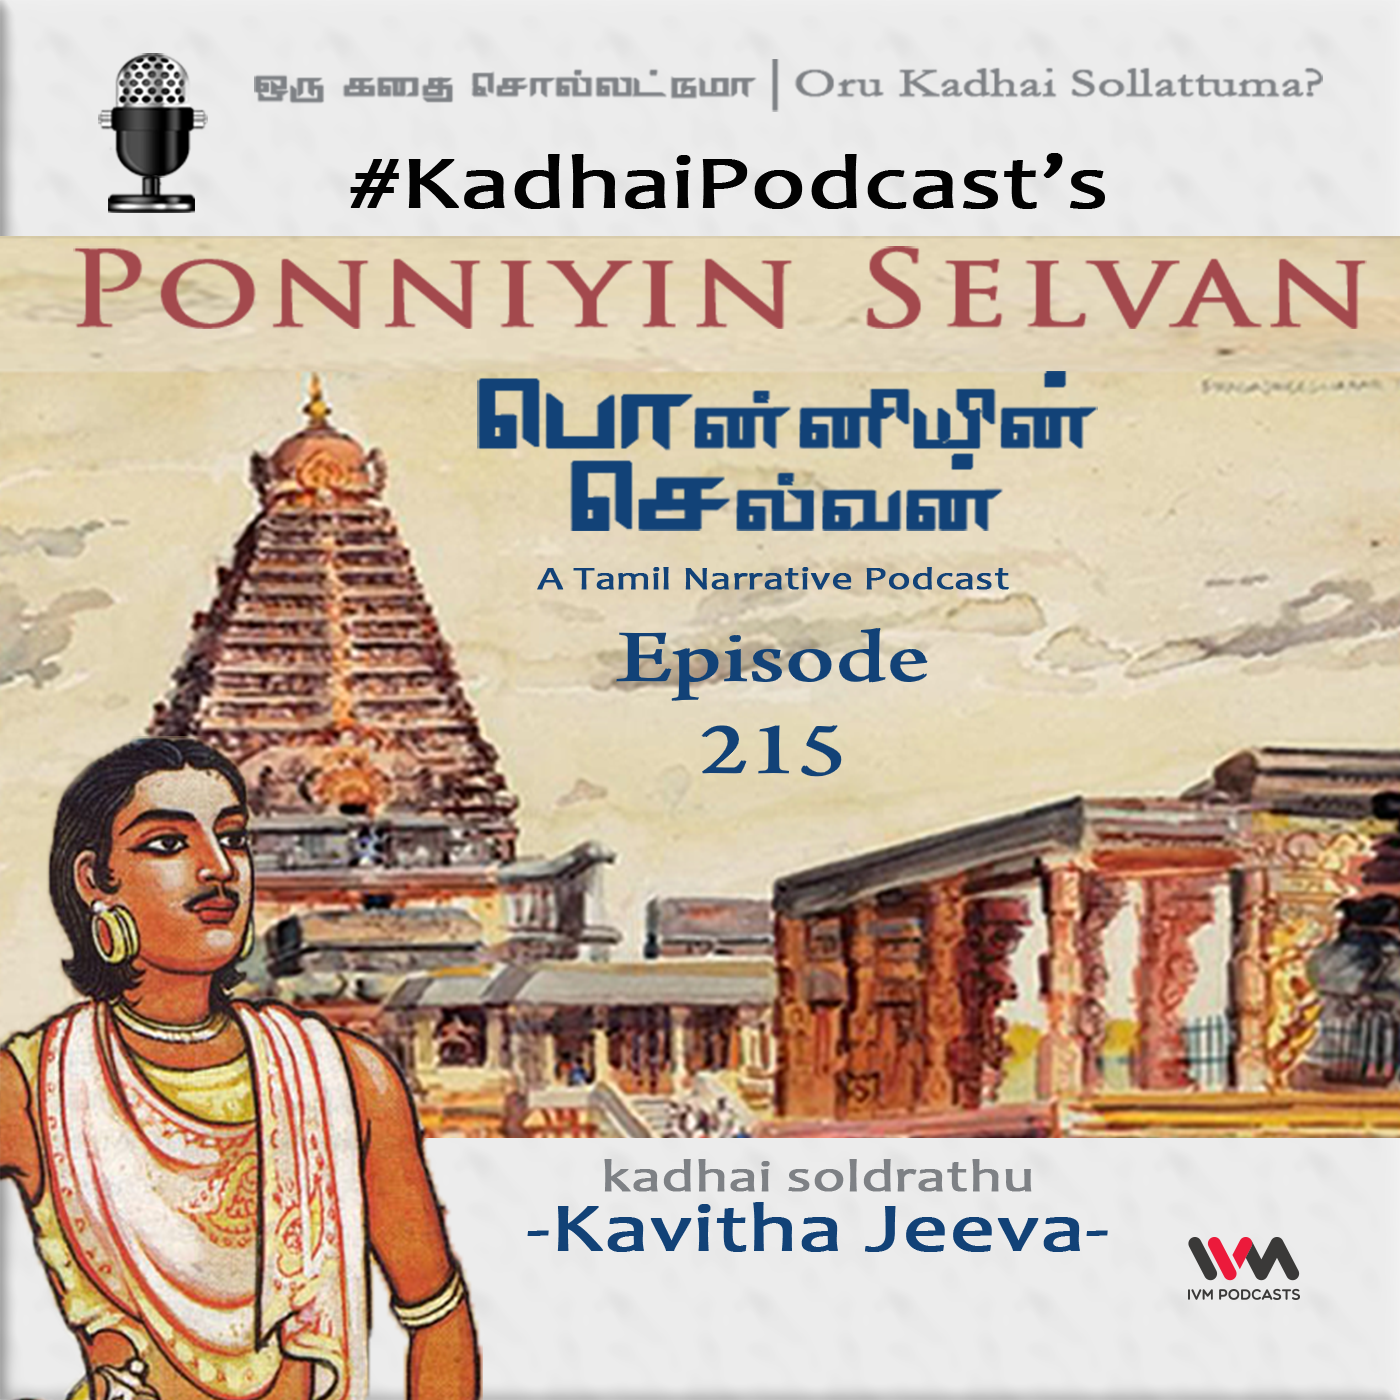 KadhaiPodcast's Ponniyin Selvan - Episode # 215